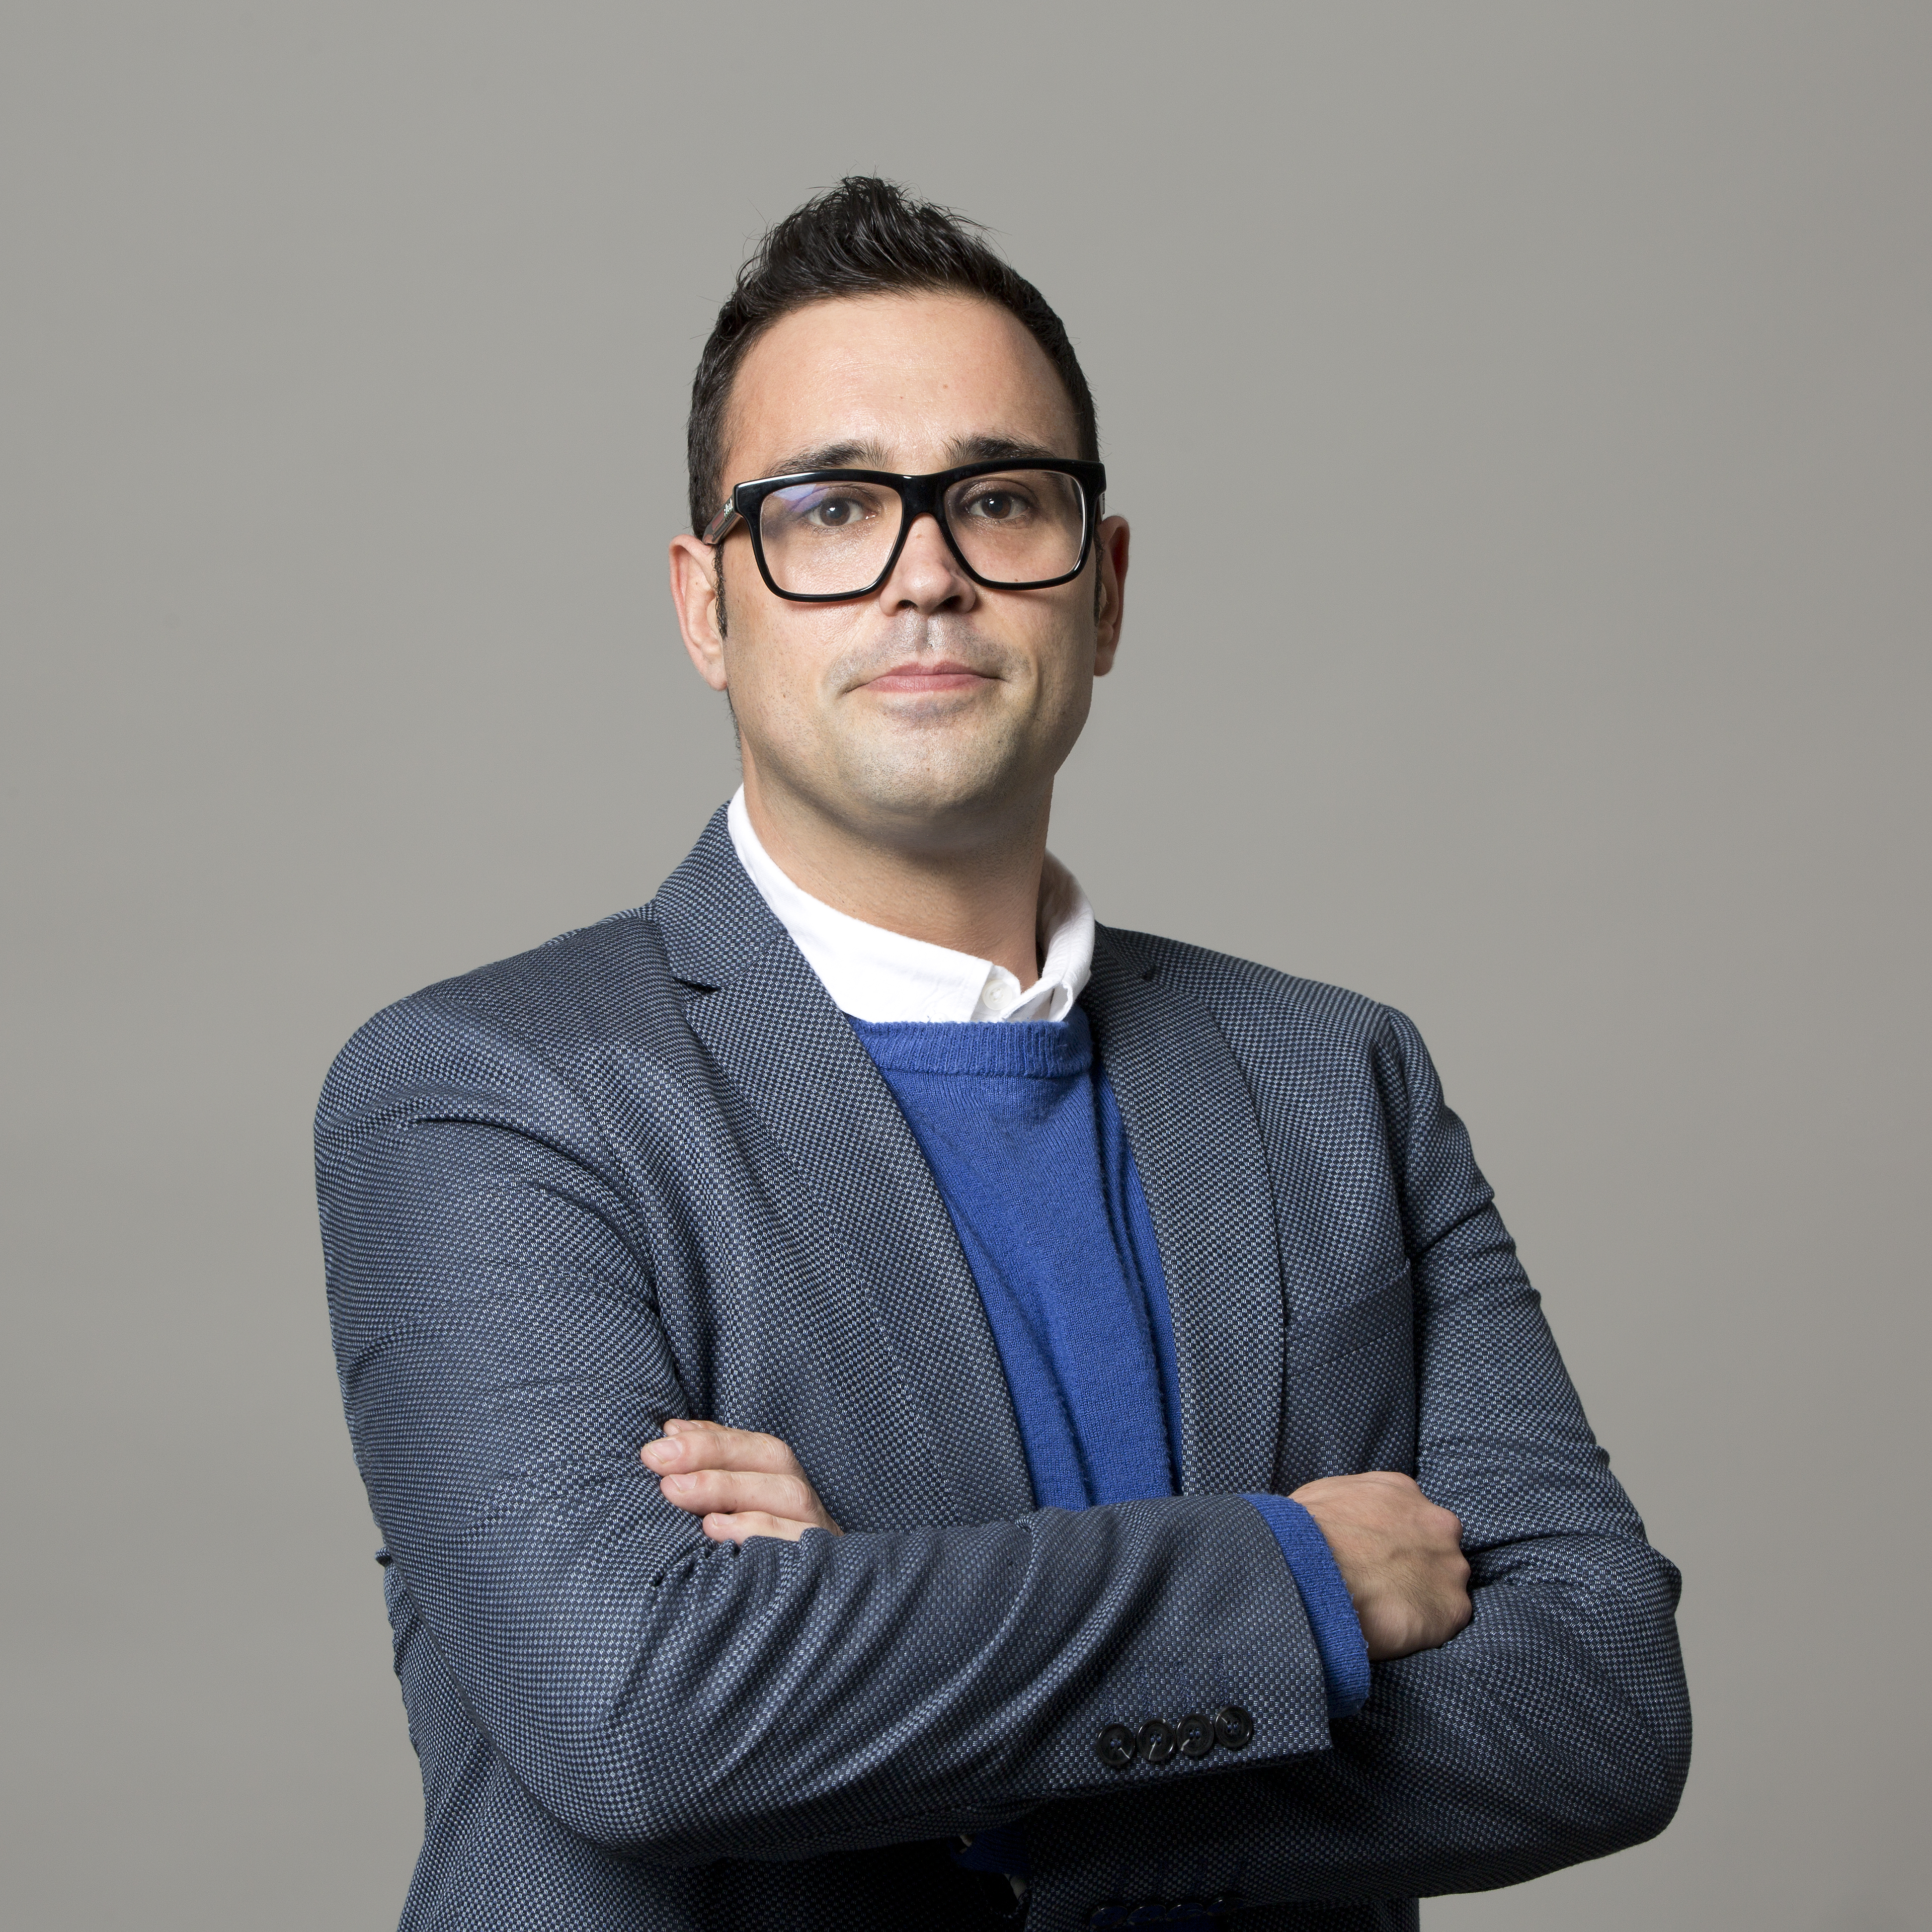 Sergio Fraile